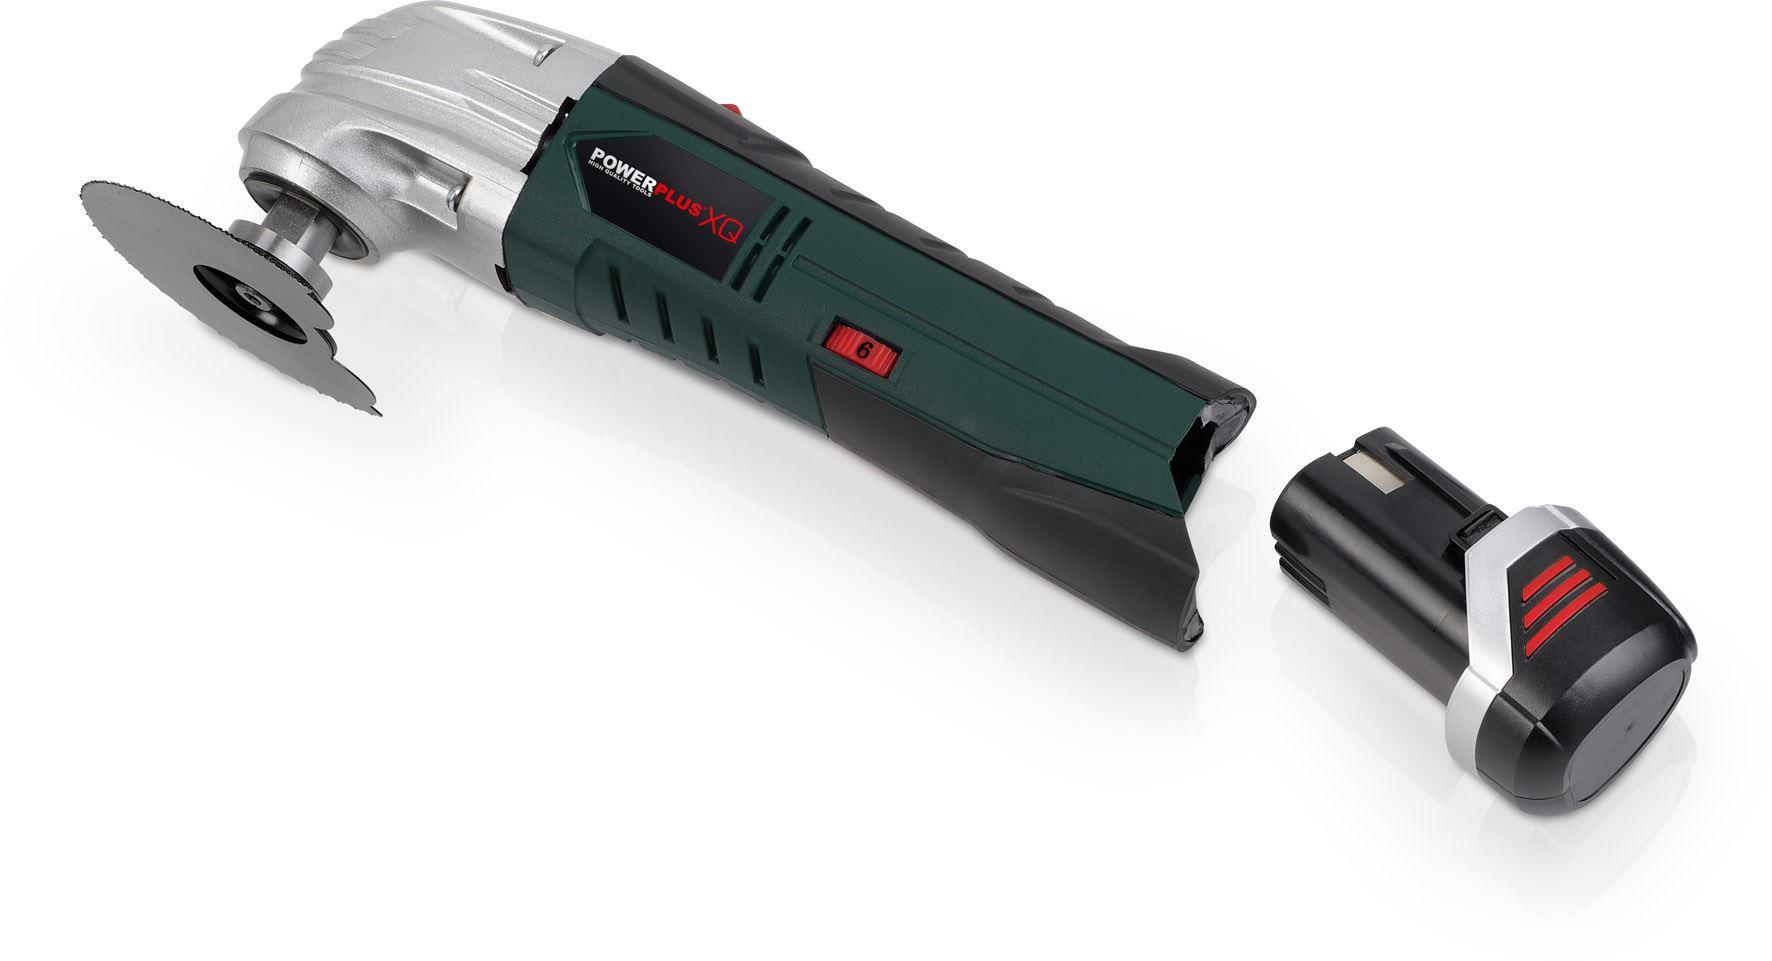 Powerplus POWXQ5271 Oscillerende Multitool | 12V LI-ION